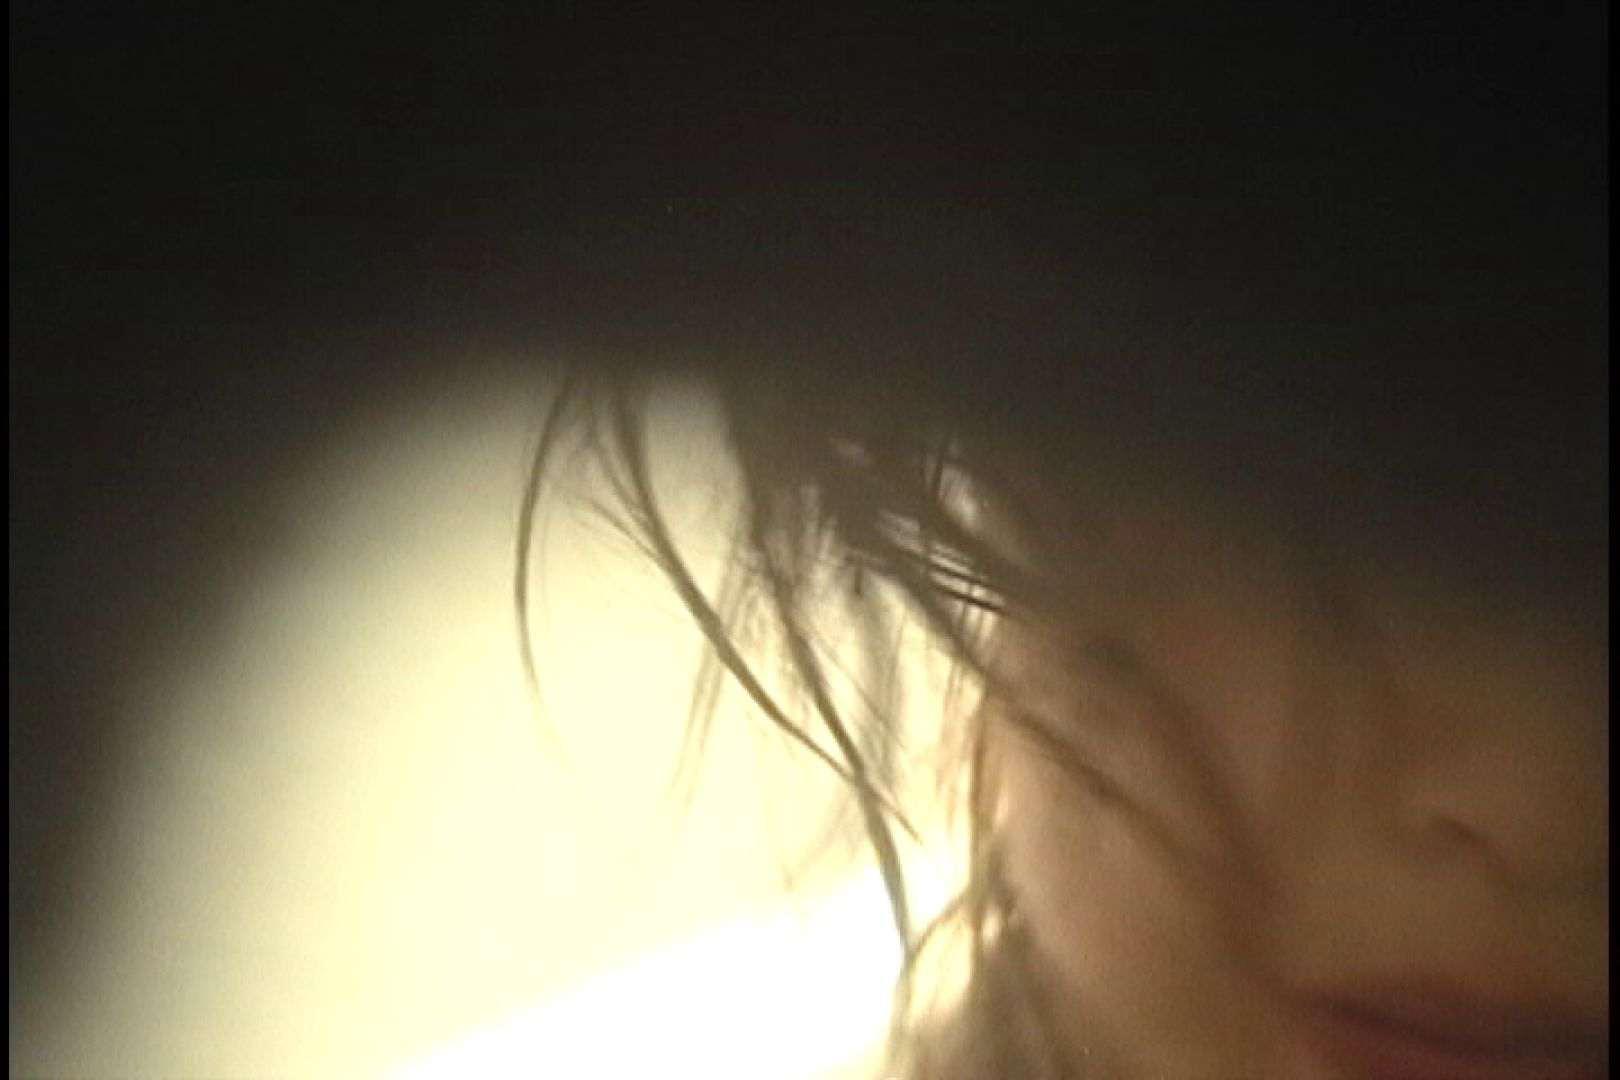 No.32 脇とVラインの処理が甘い貧乳ギャル、タンポンの紐がぶらぶら シャワー室 | 乙女H映像  88画像 14